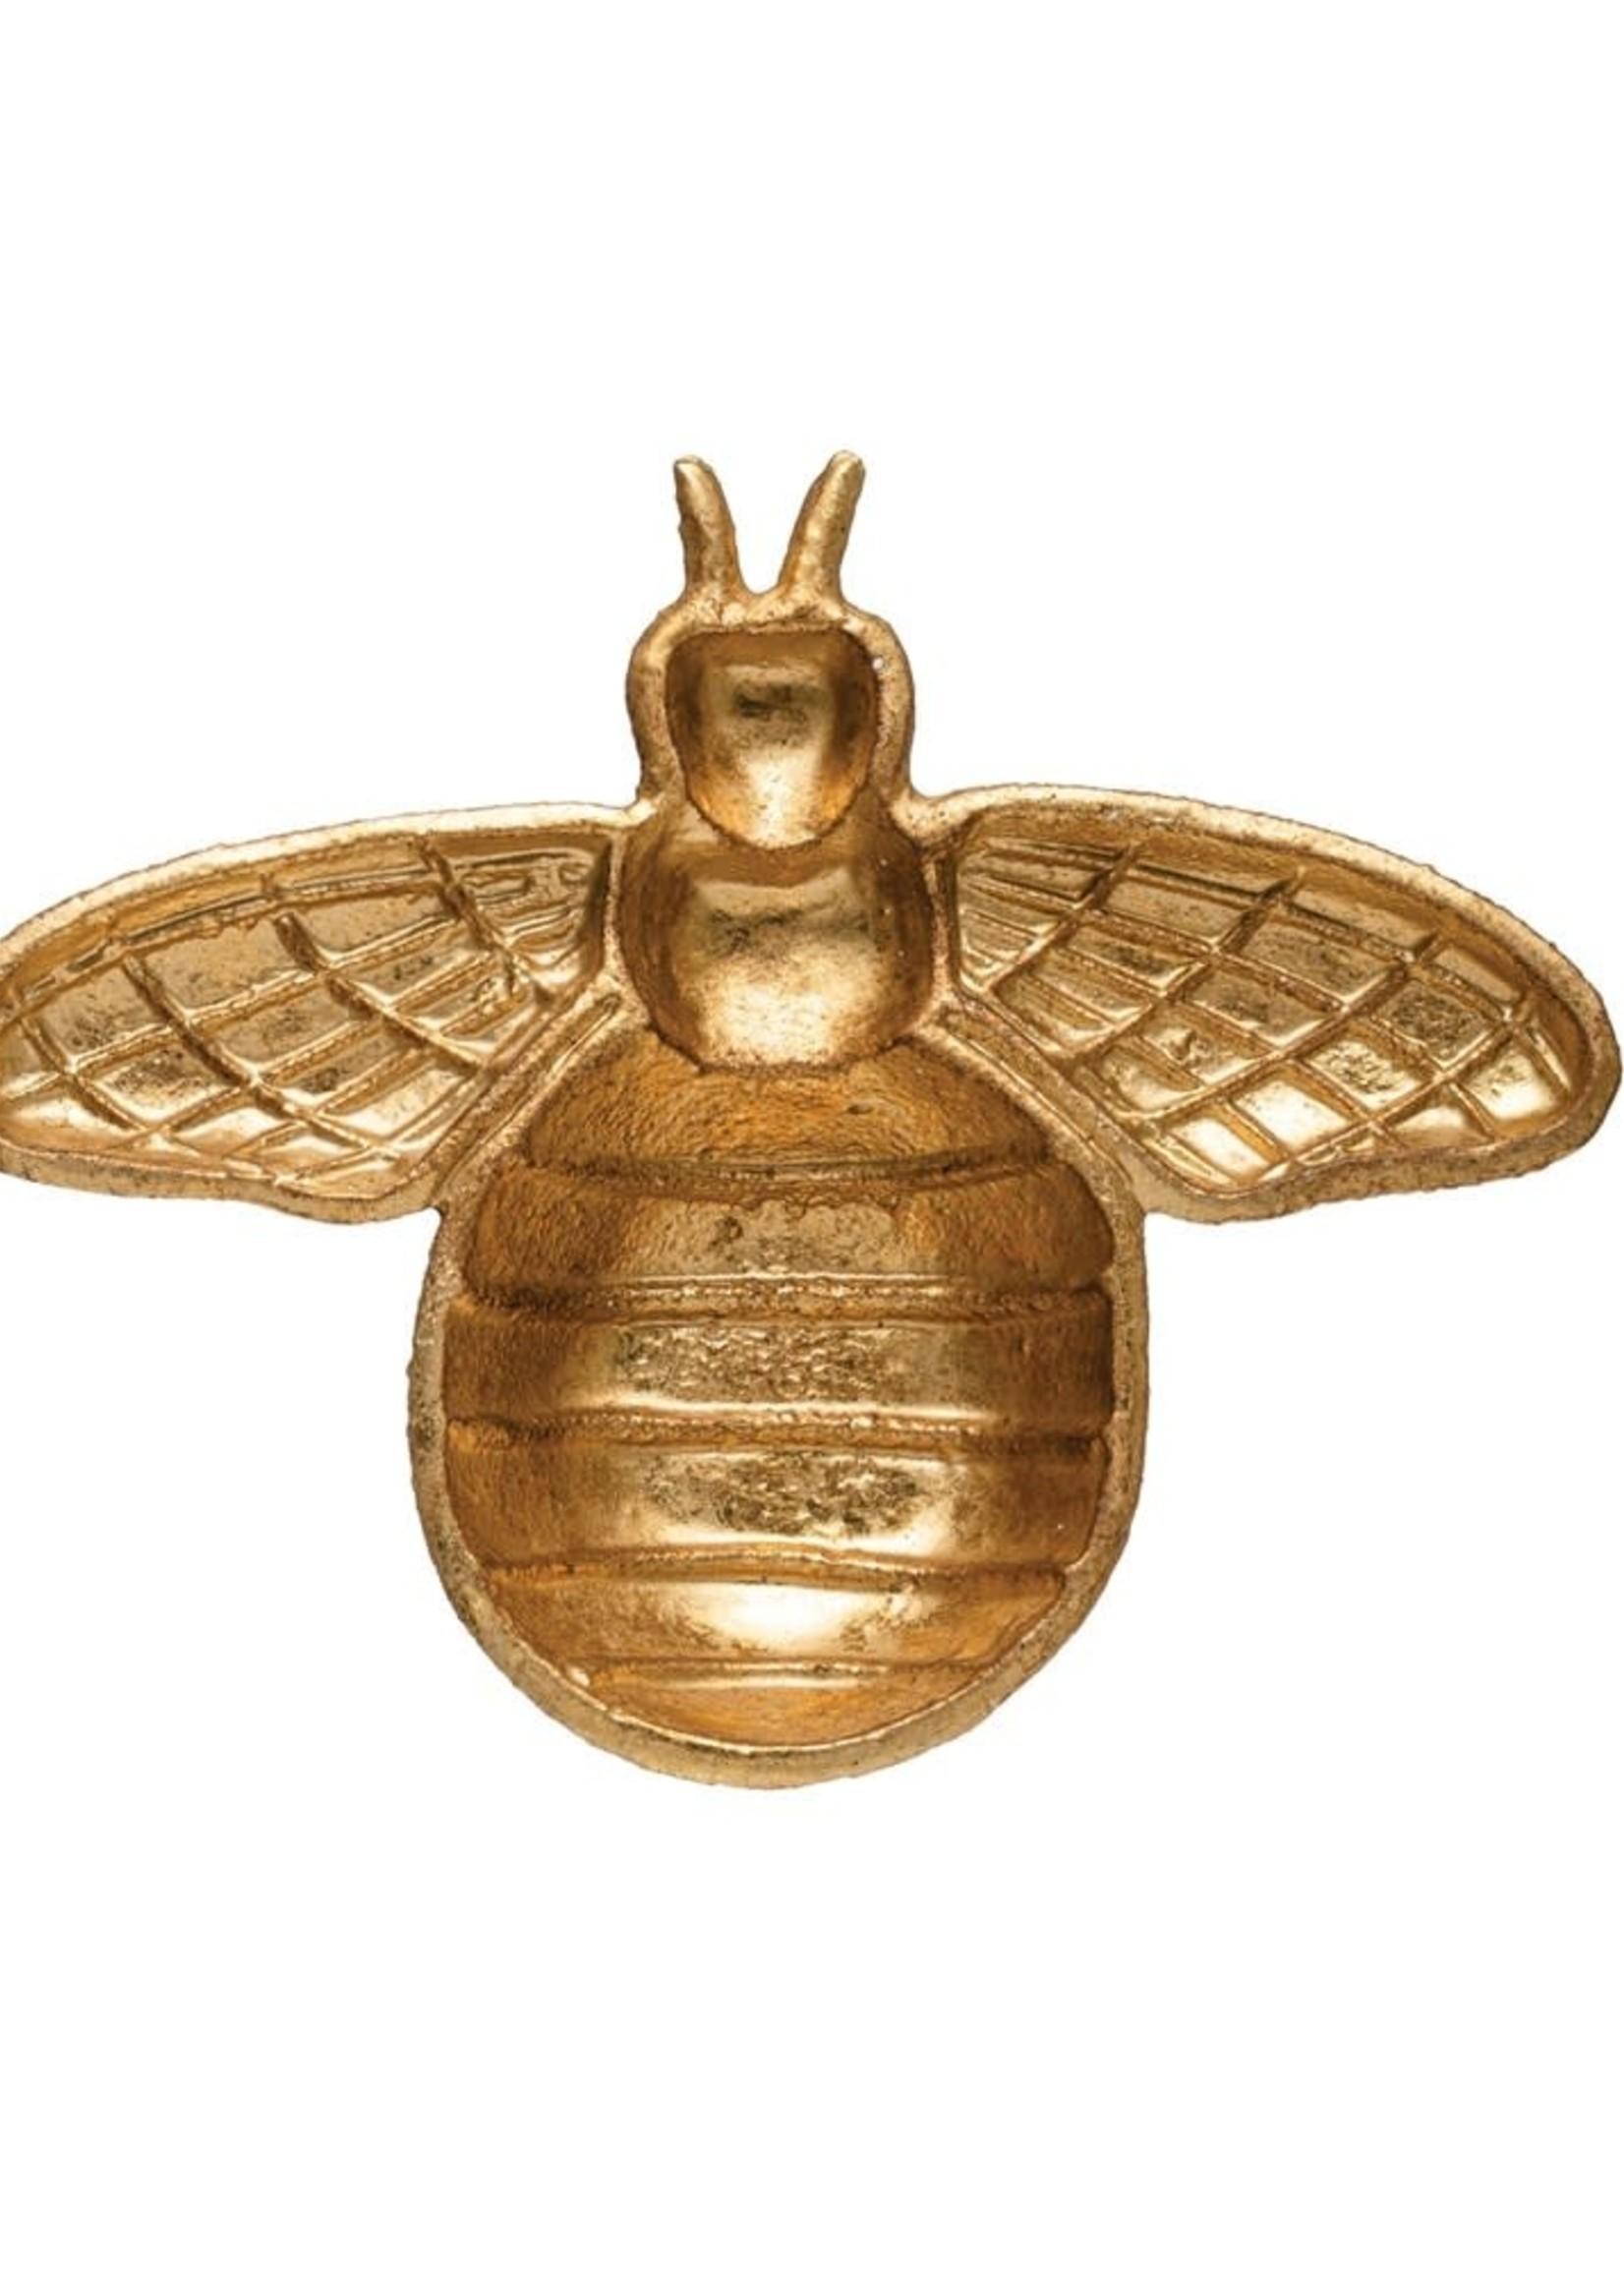 Decorative Cast Iron Bee Shaped Dish, Gold Finish